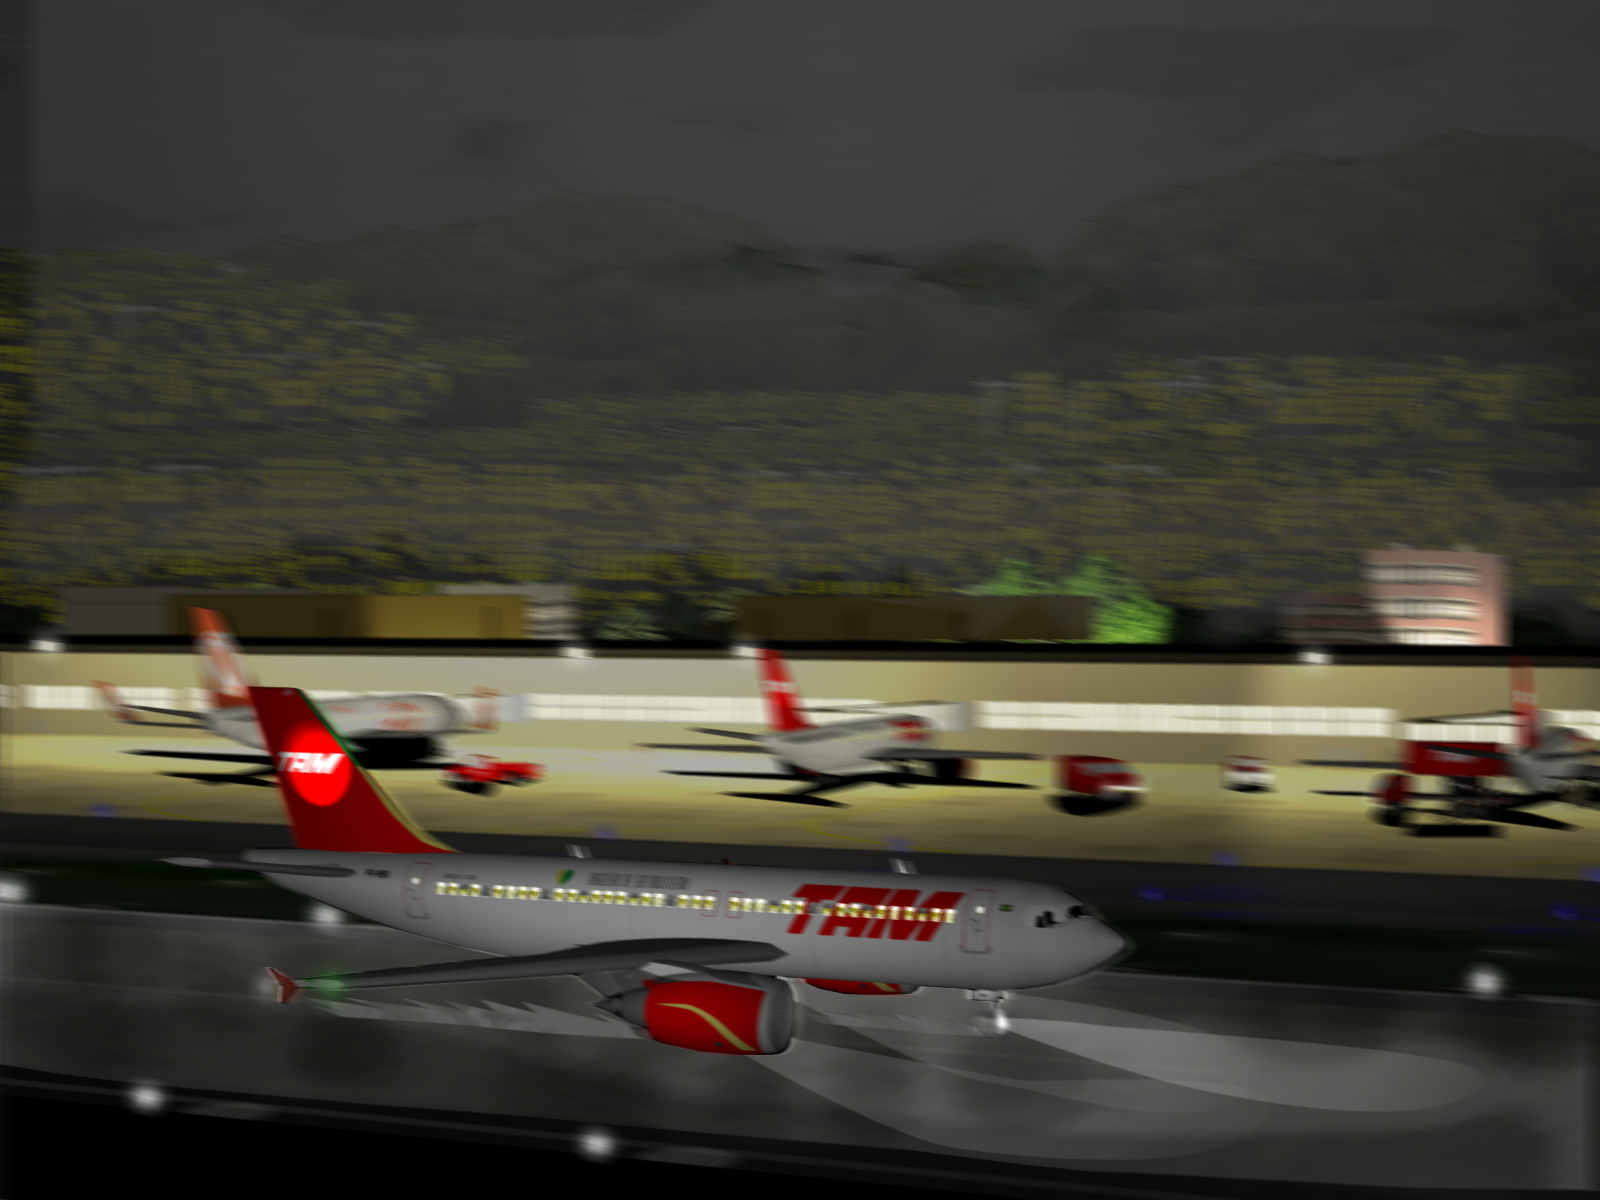 TAM Airlinesi lend 3054